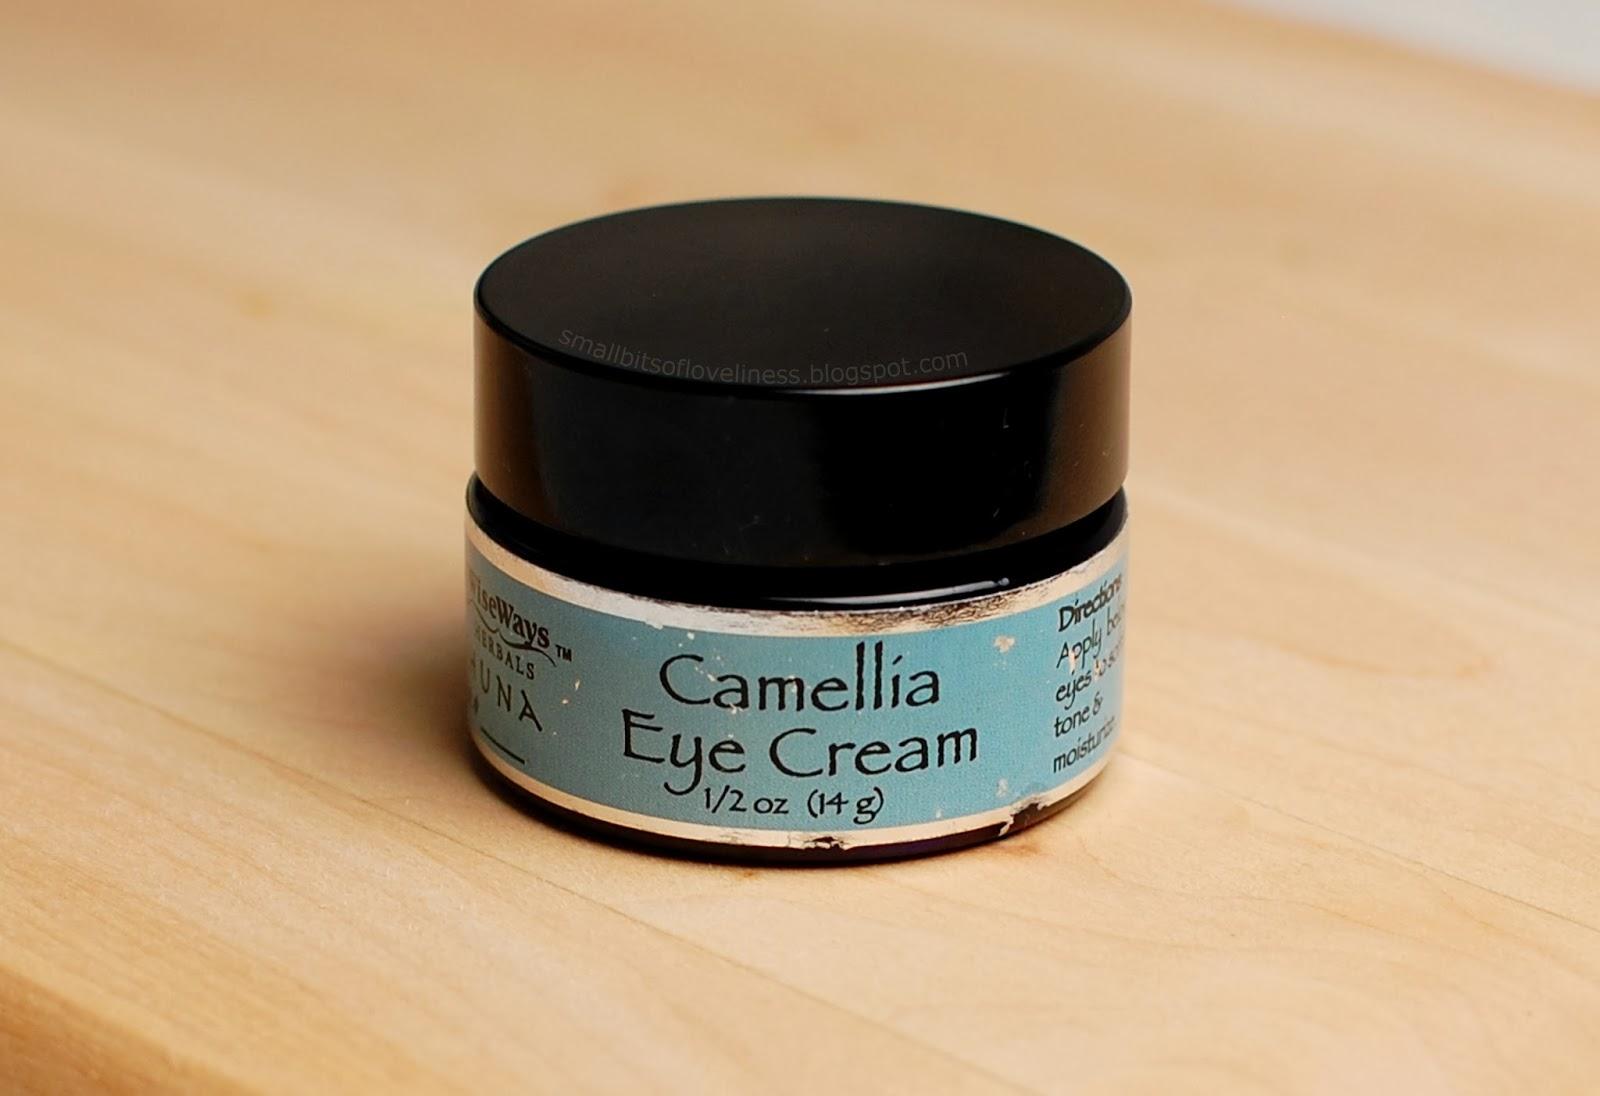 Camellia Eye Cream